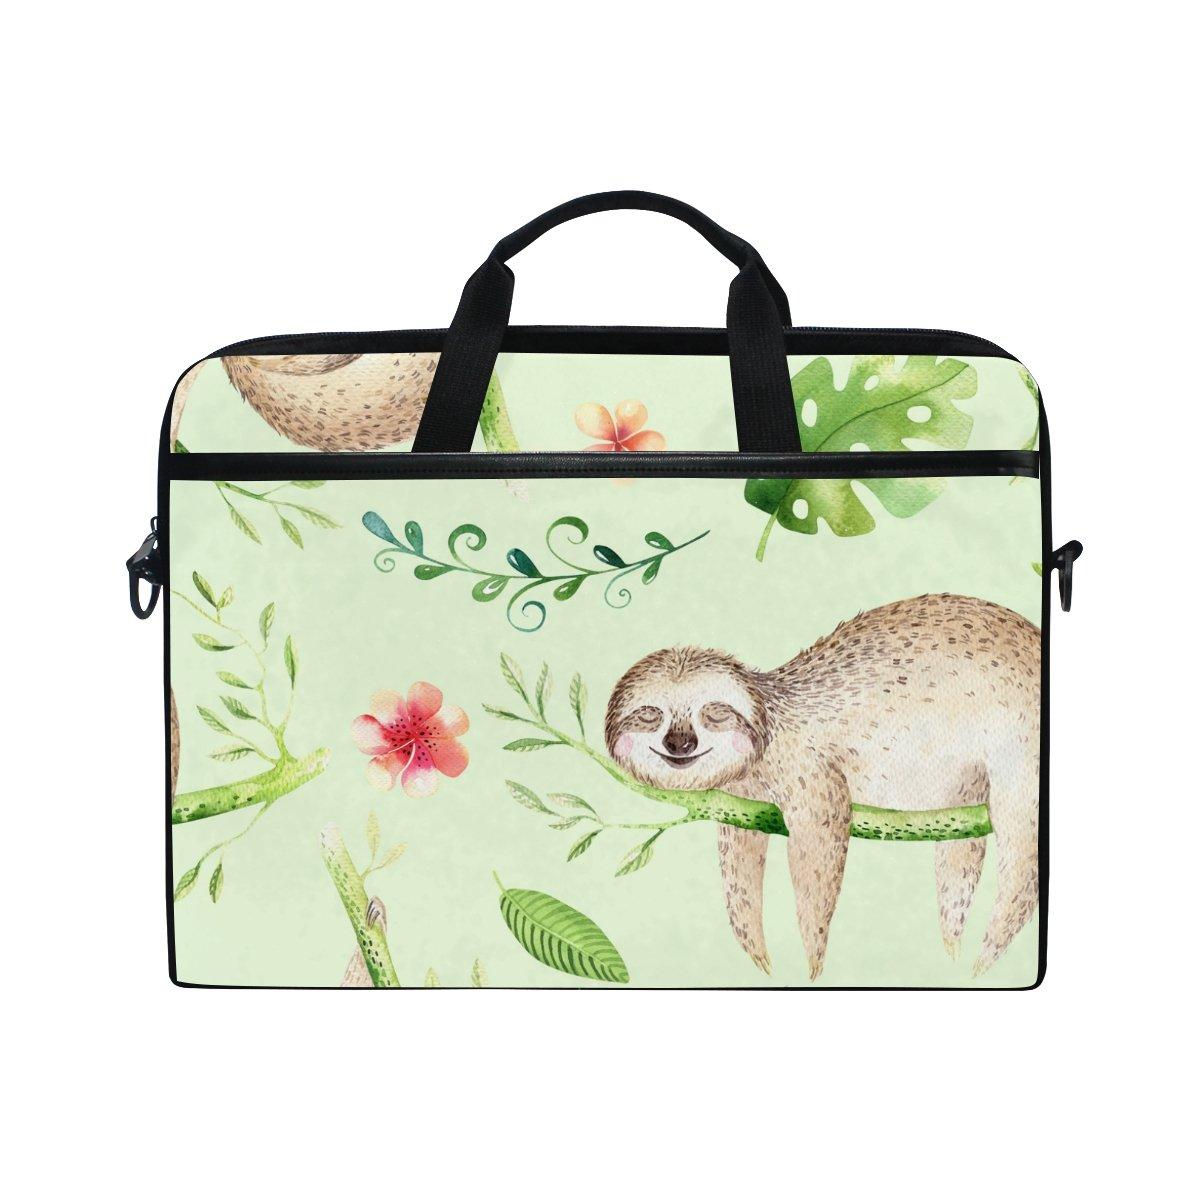 d1c391f396 chic AHOMY Cartoon Baby Sloth Tree 15 Inch Laptop Shoulder Sleeve Messenger  Bag Case